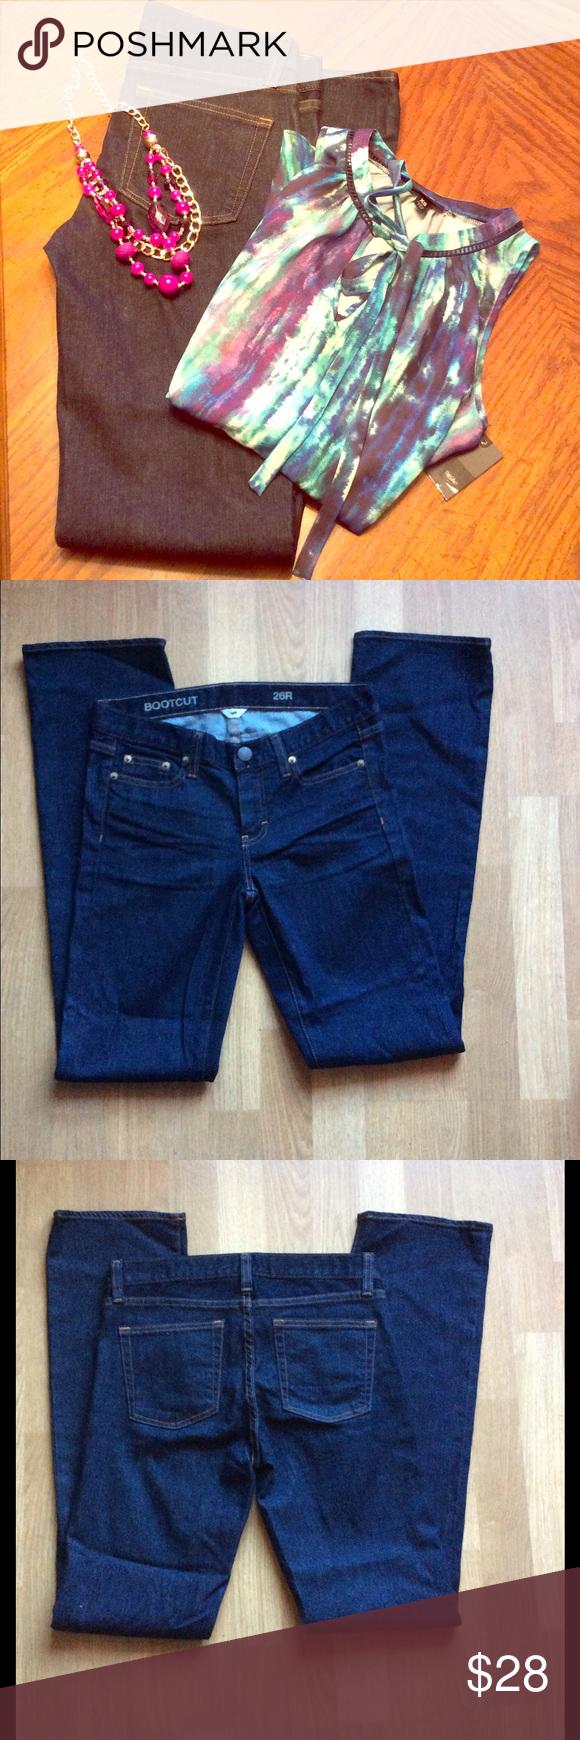 J. Crew Jeans NWOT J Crew jeans. Size 26/R. Dark denim. Boot cut. 93% cotton. 6% polyester 1% spandex. NWOT J. Crew Jeans Boot Cut